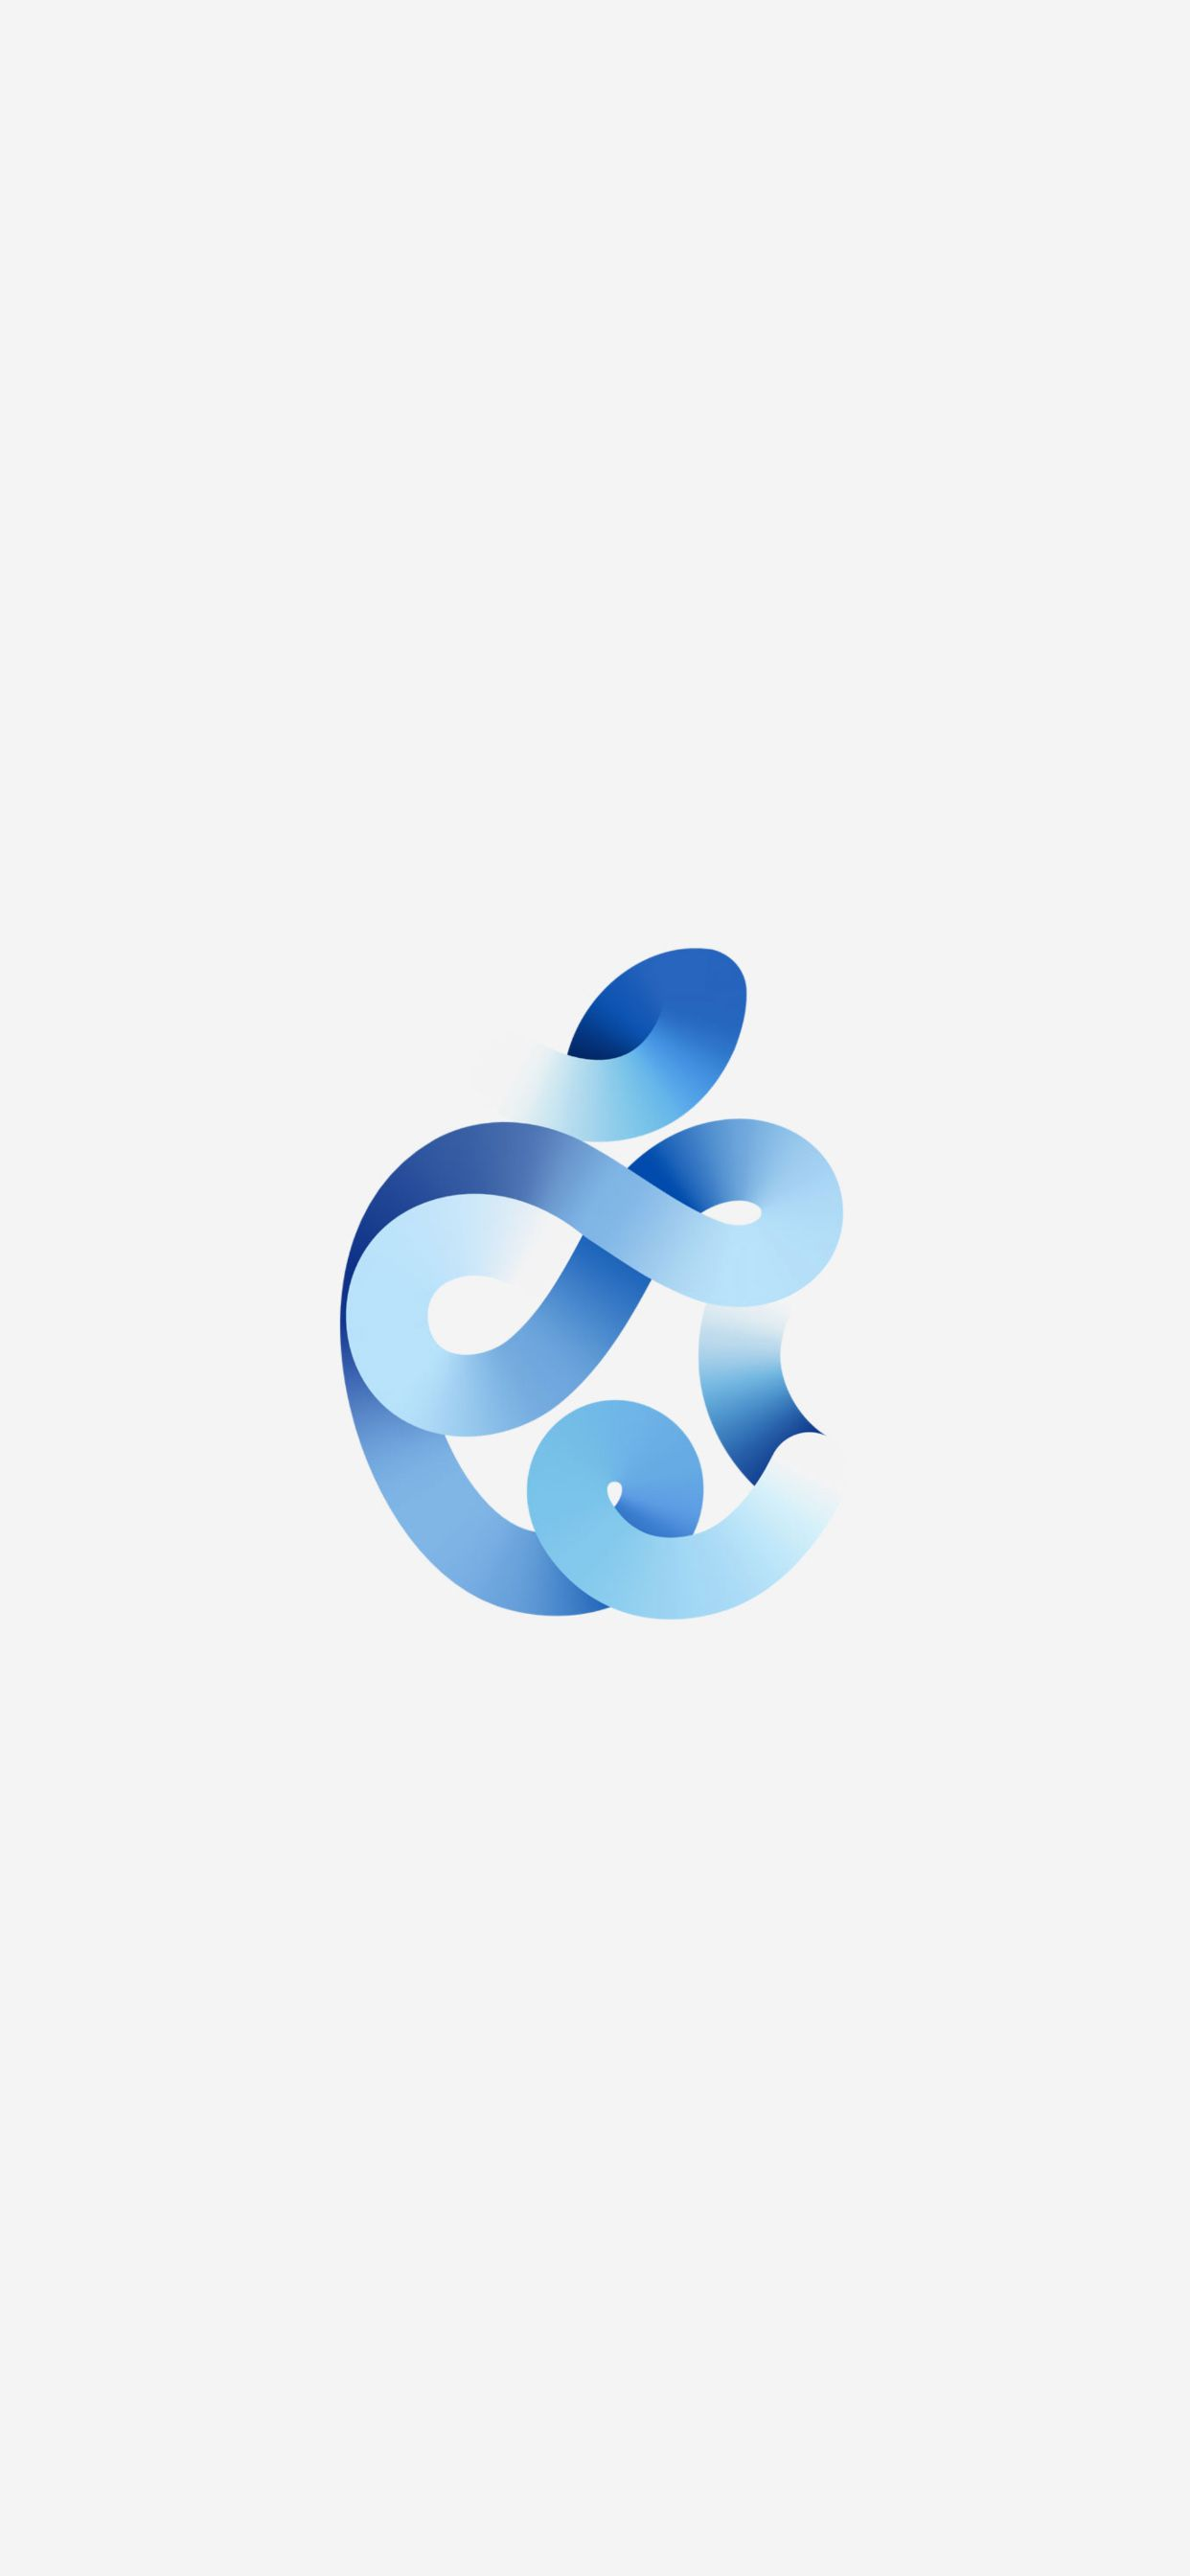 Ar7 On Twitter Apple Logo Wallpaper Iphone Apple Wallpaper Iphone Apple Logo Wallpaper